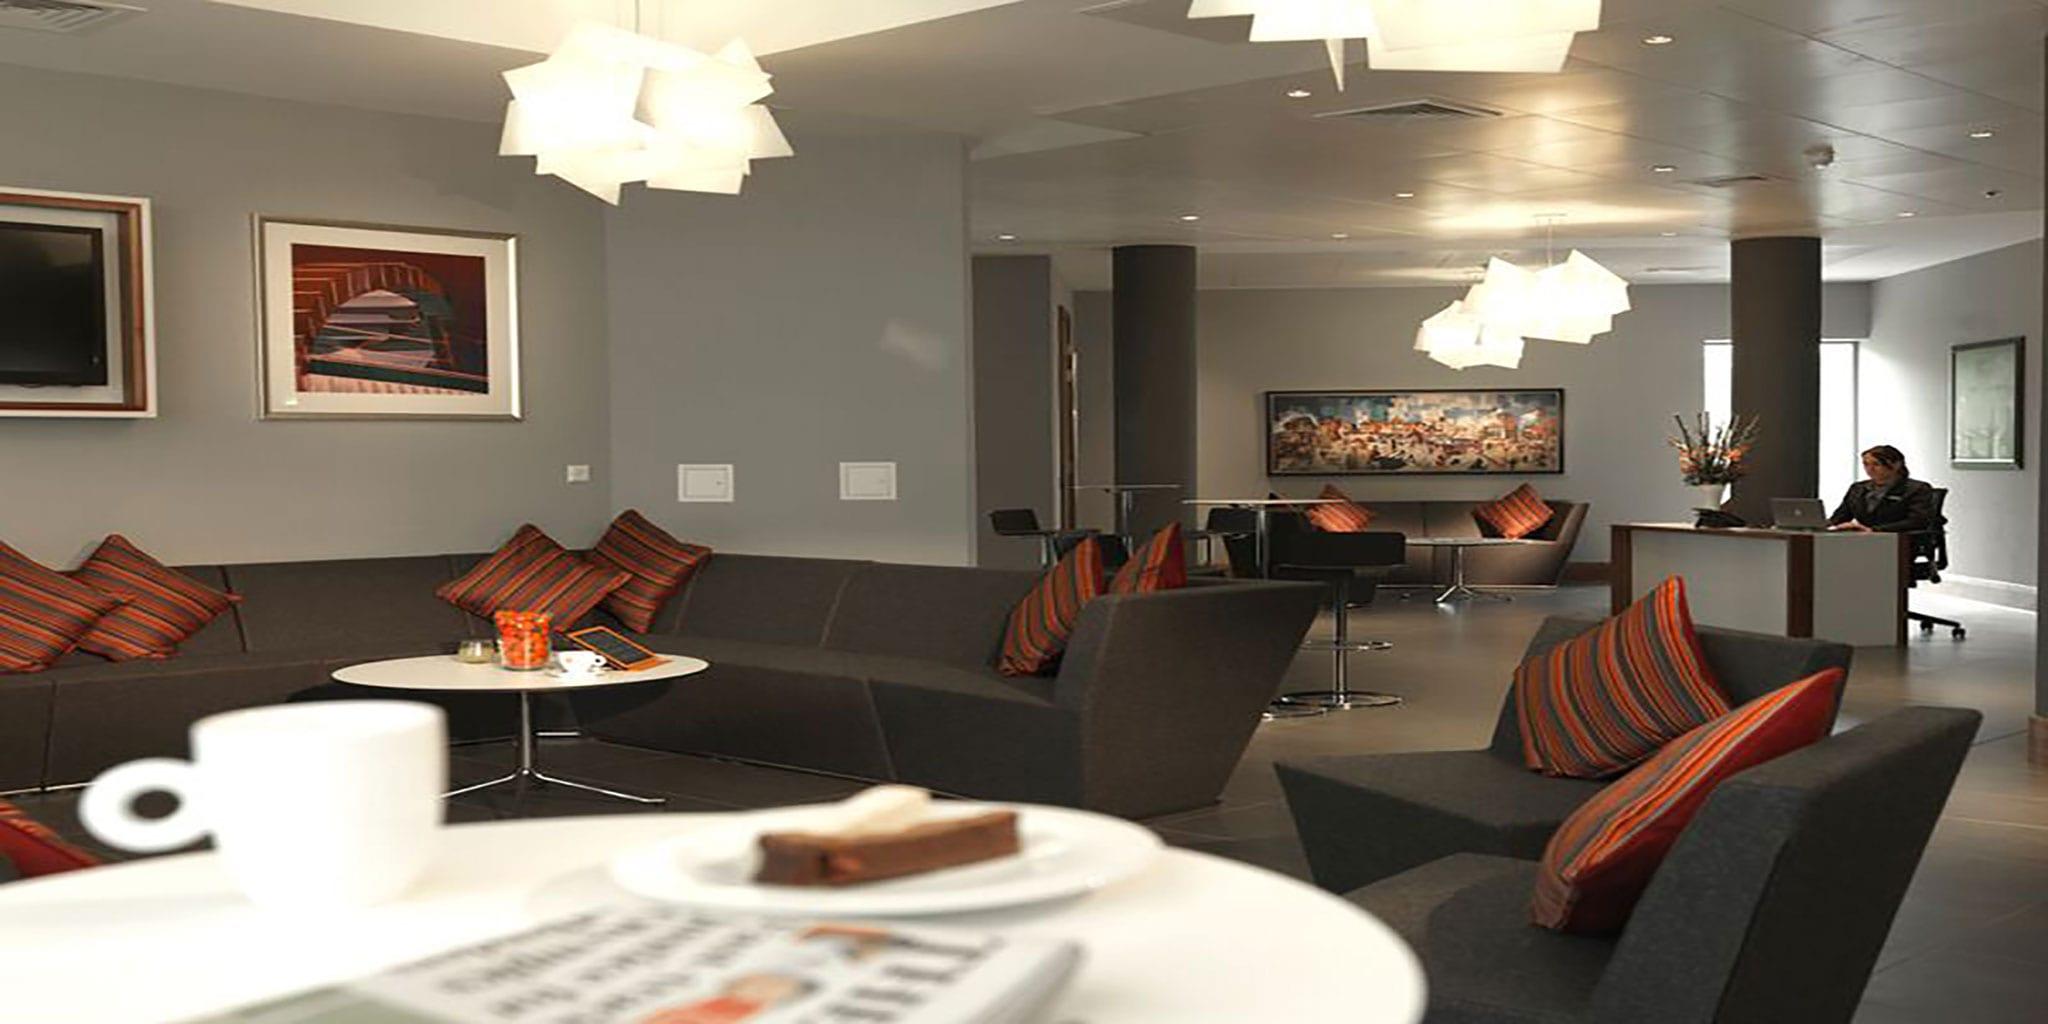 Meeting Rooms In Birmingham City Centre